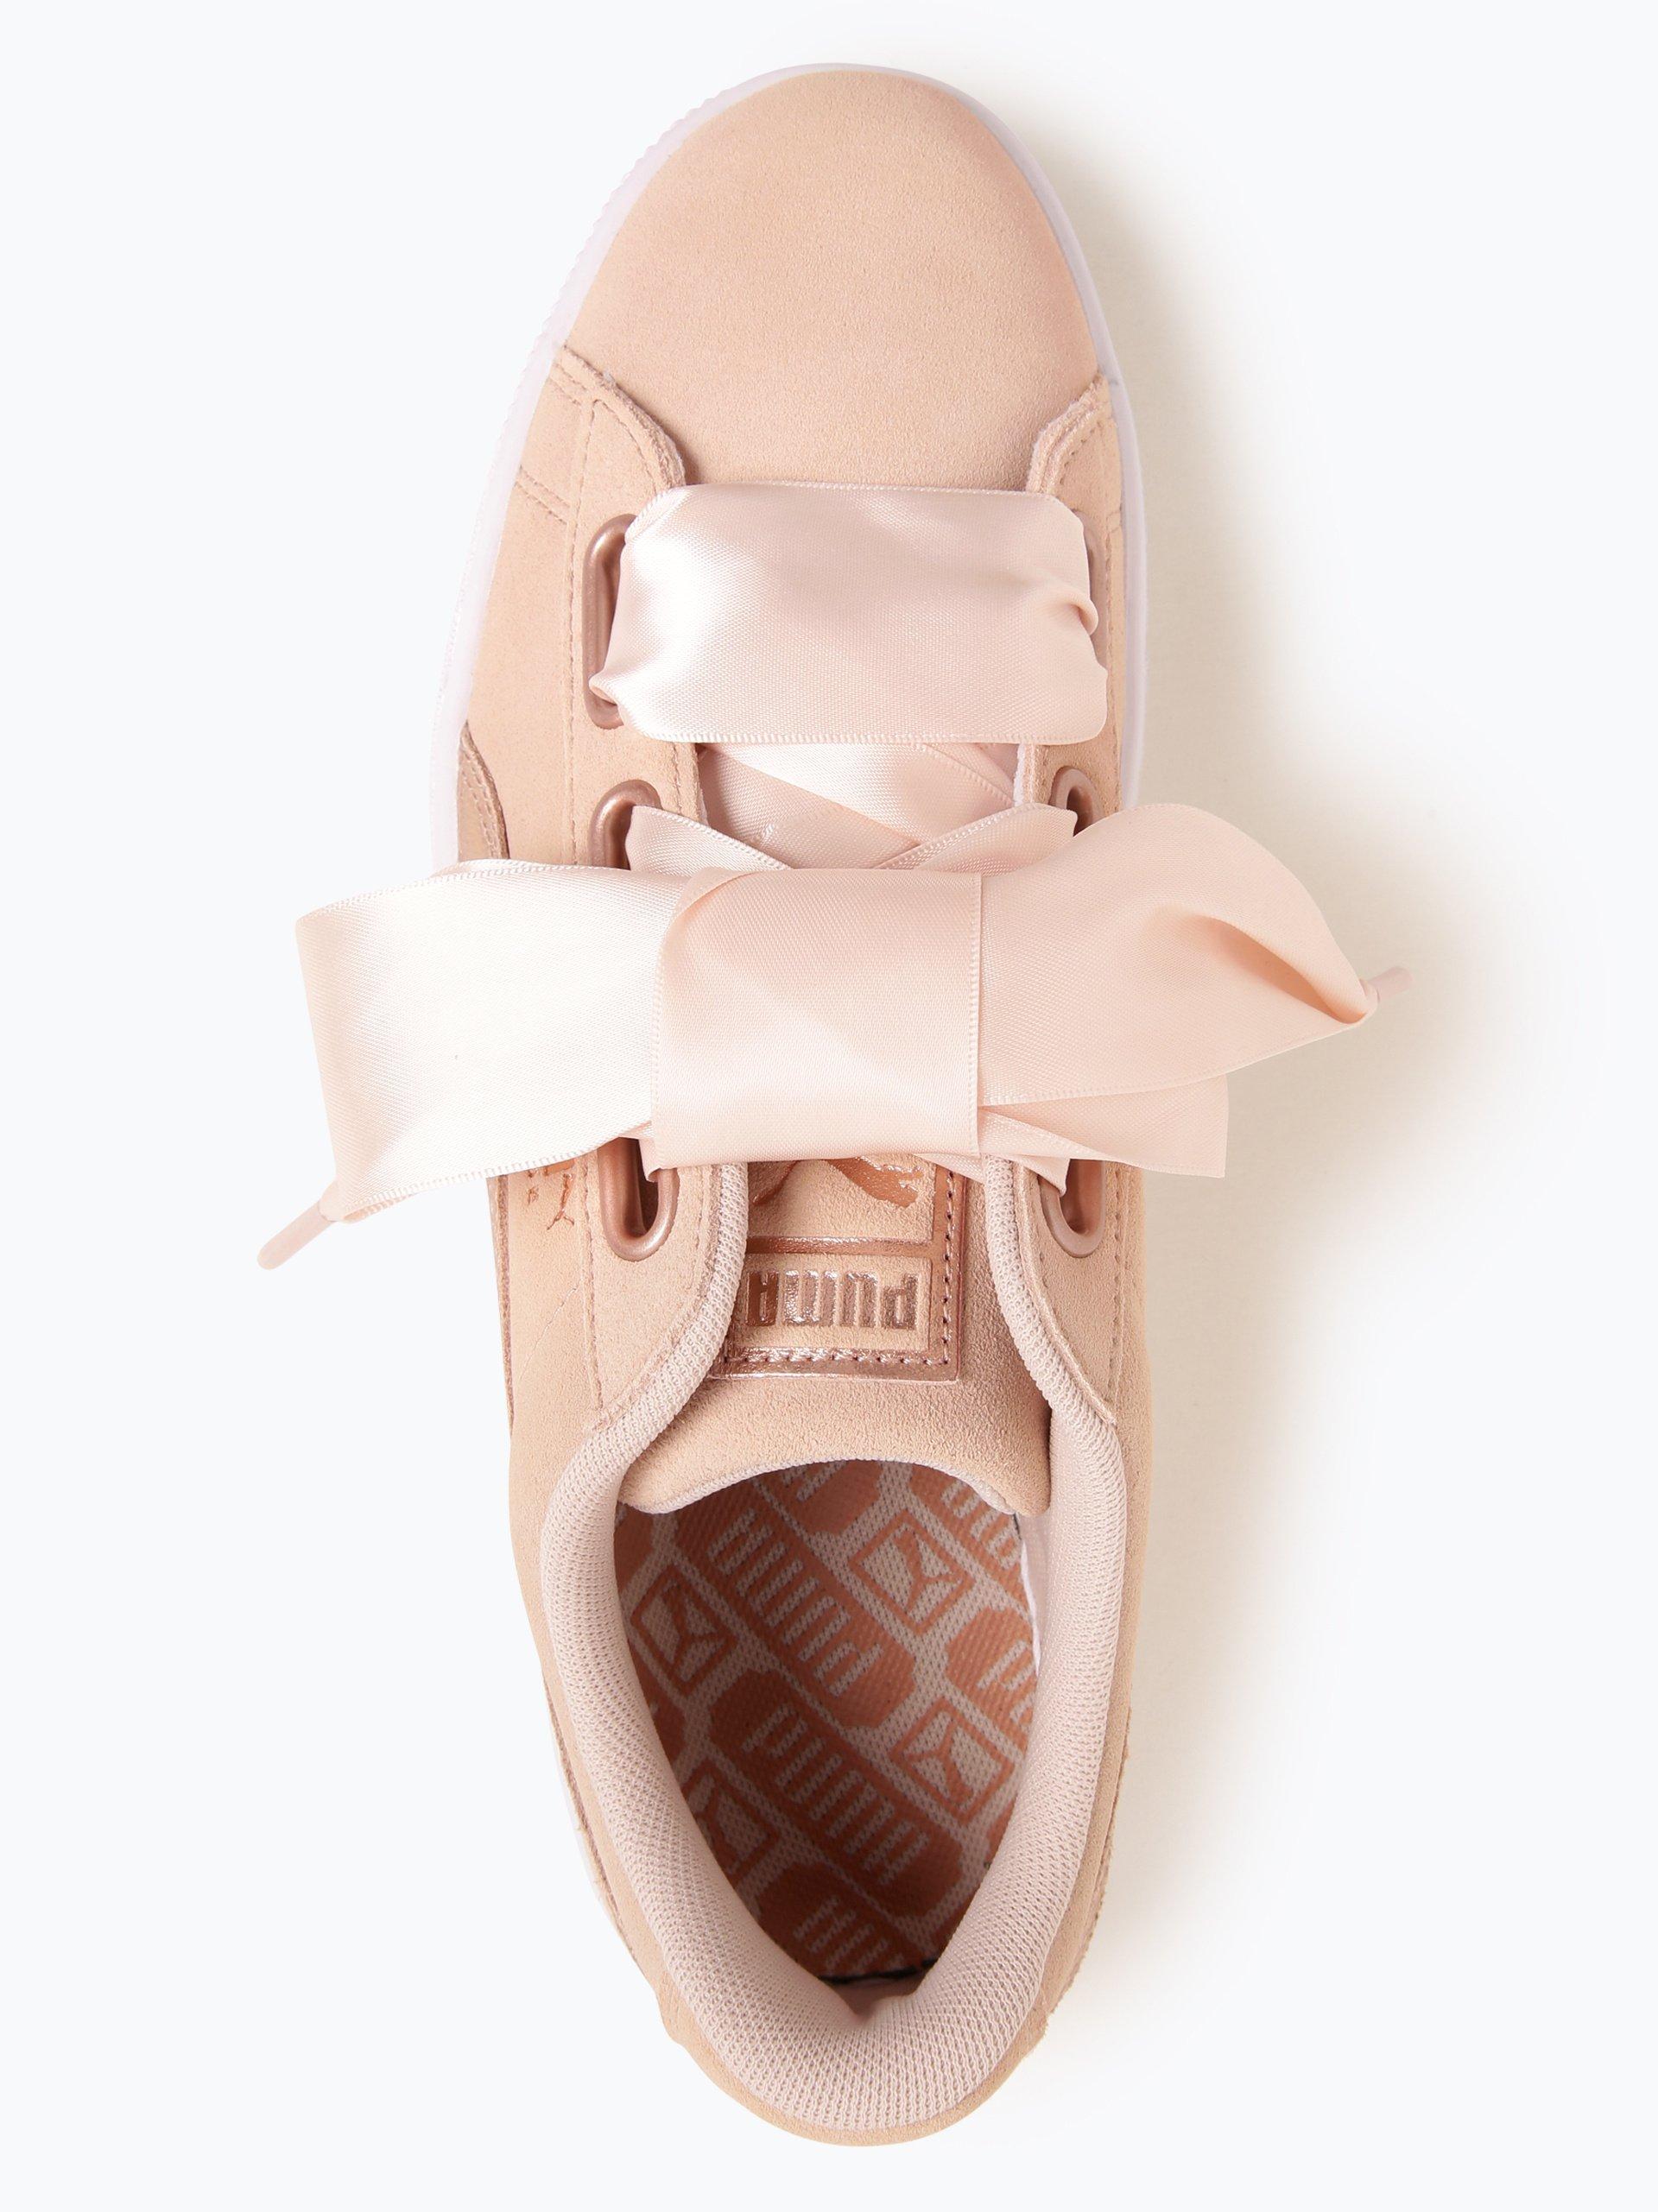 Puma Damen Sneaker aus Leder - Heart LunaLux